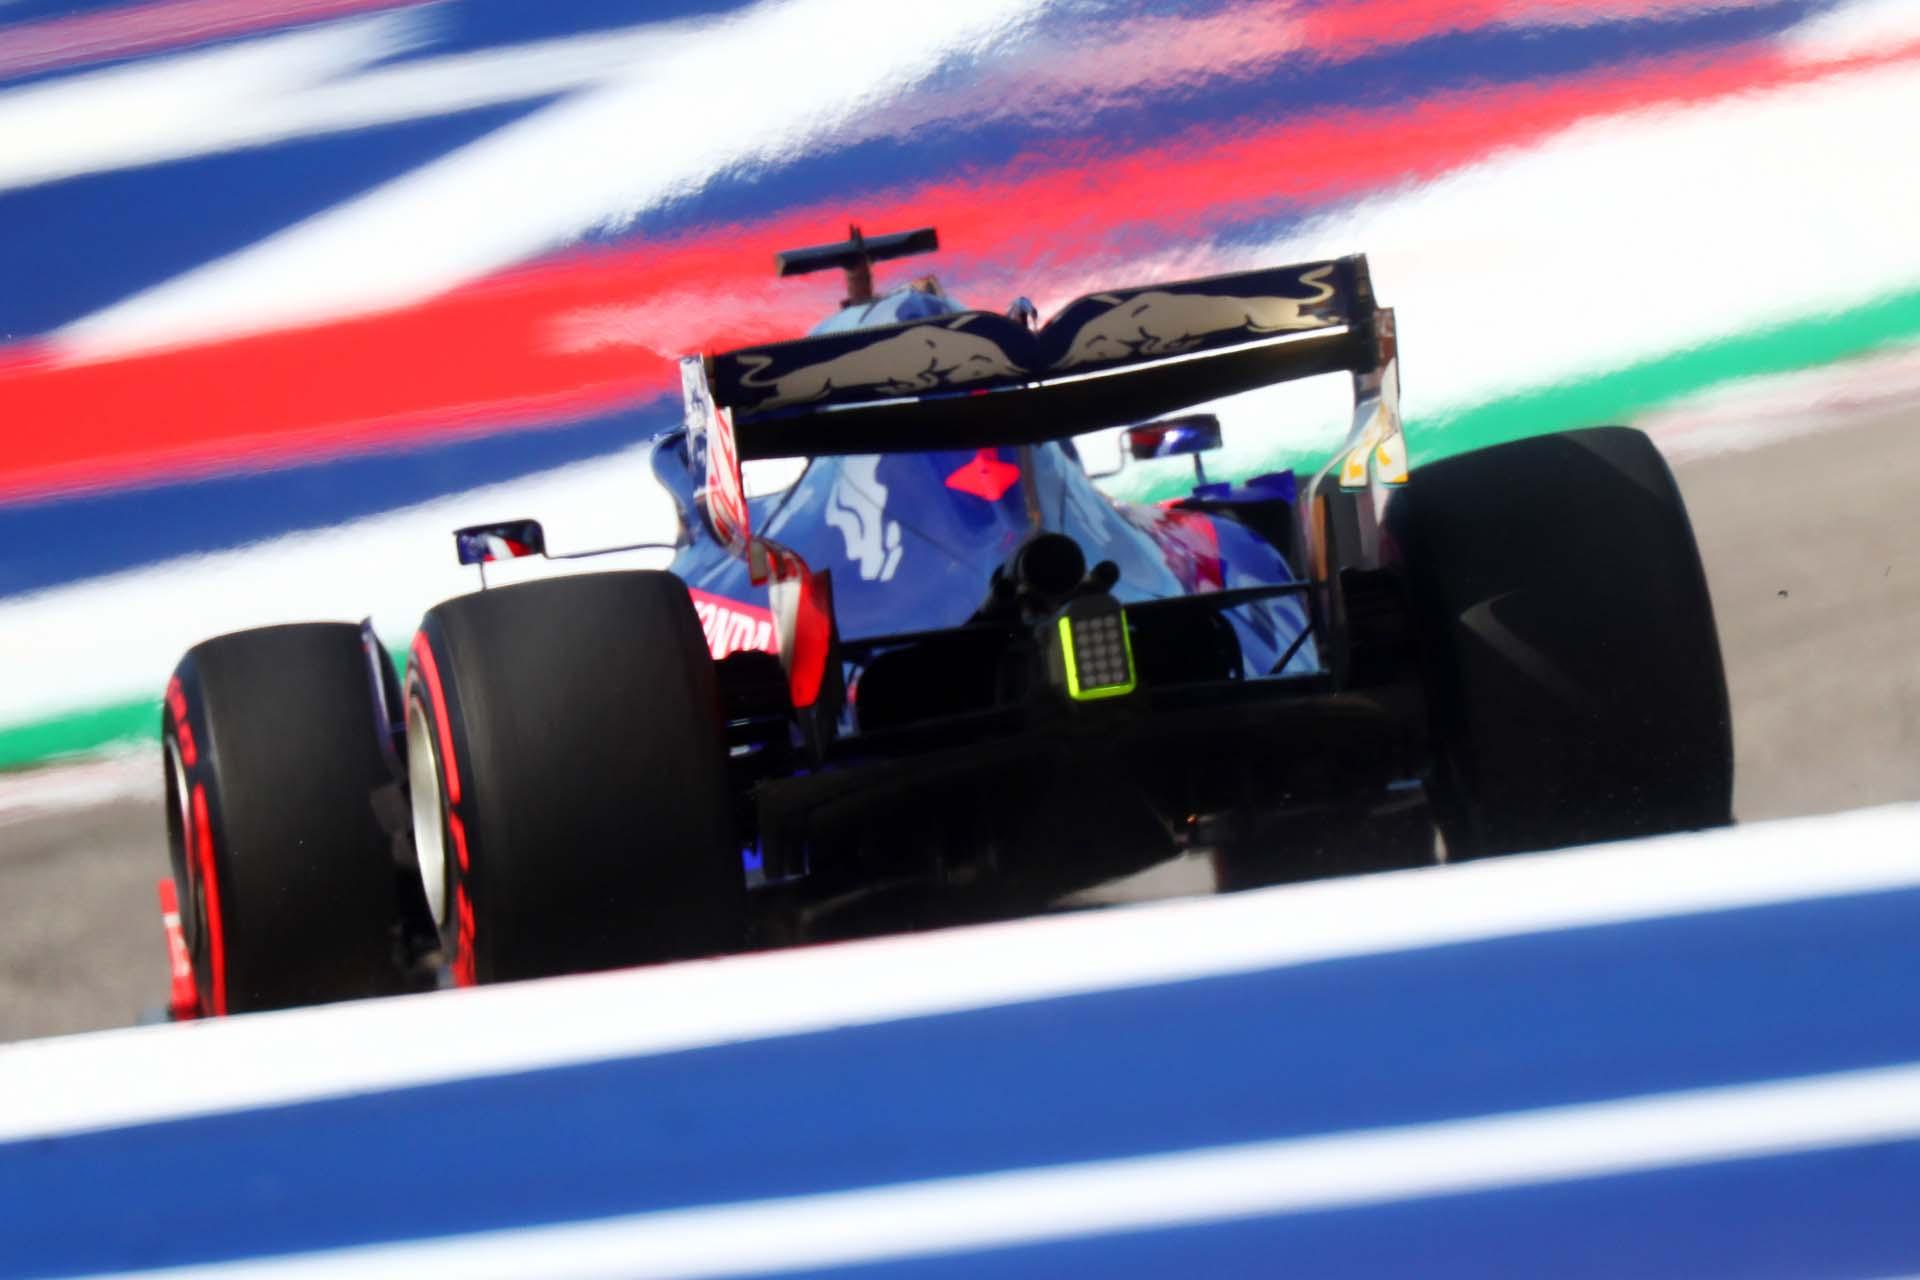 F1 Grand Prix of USA - Final Practice